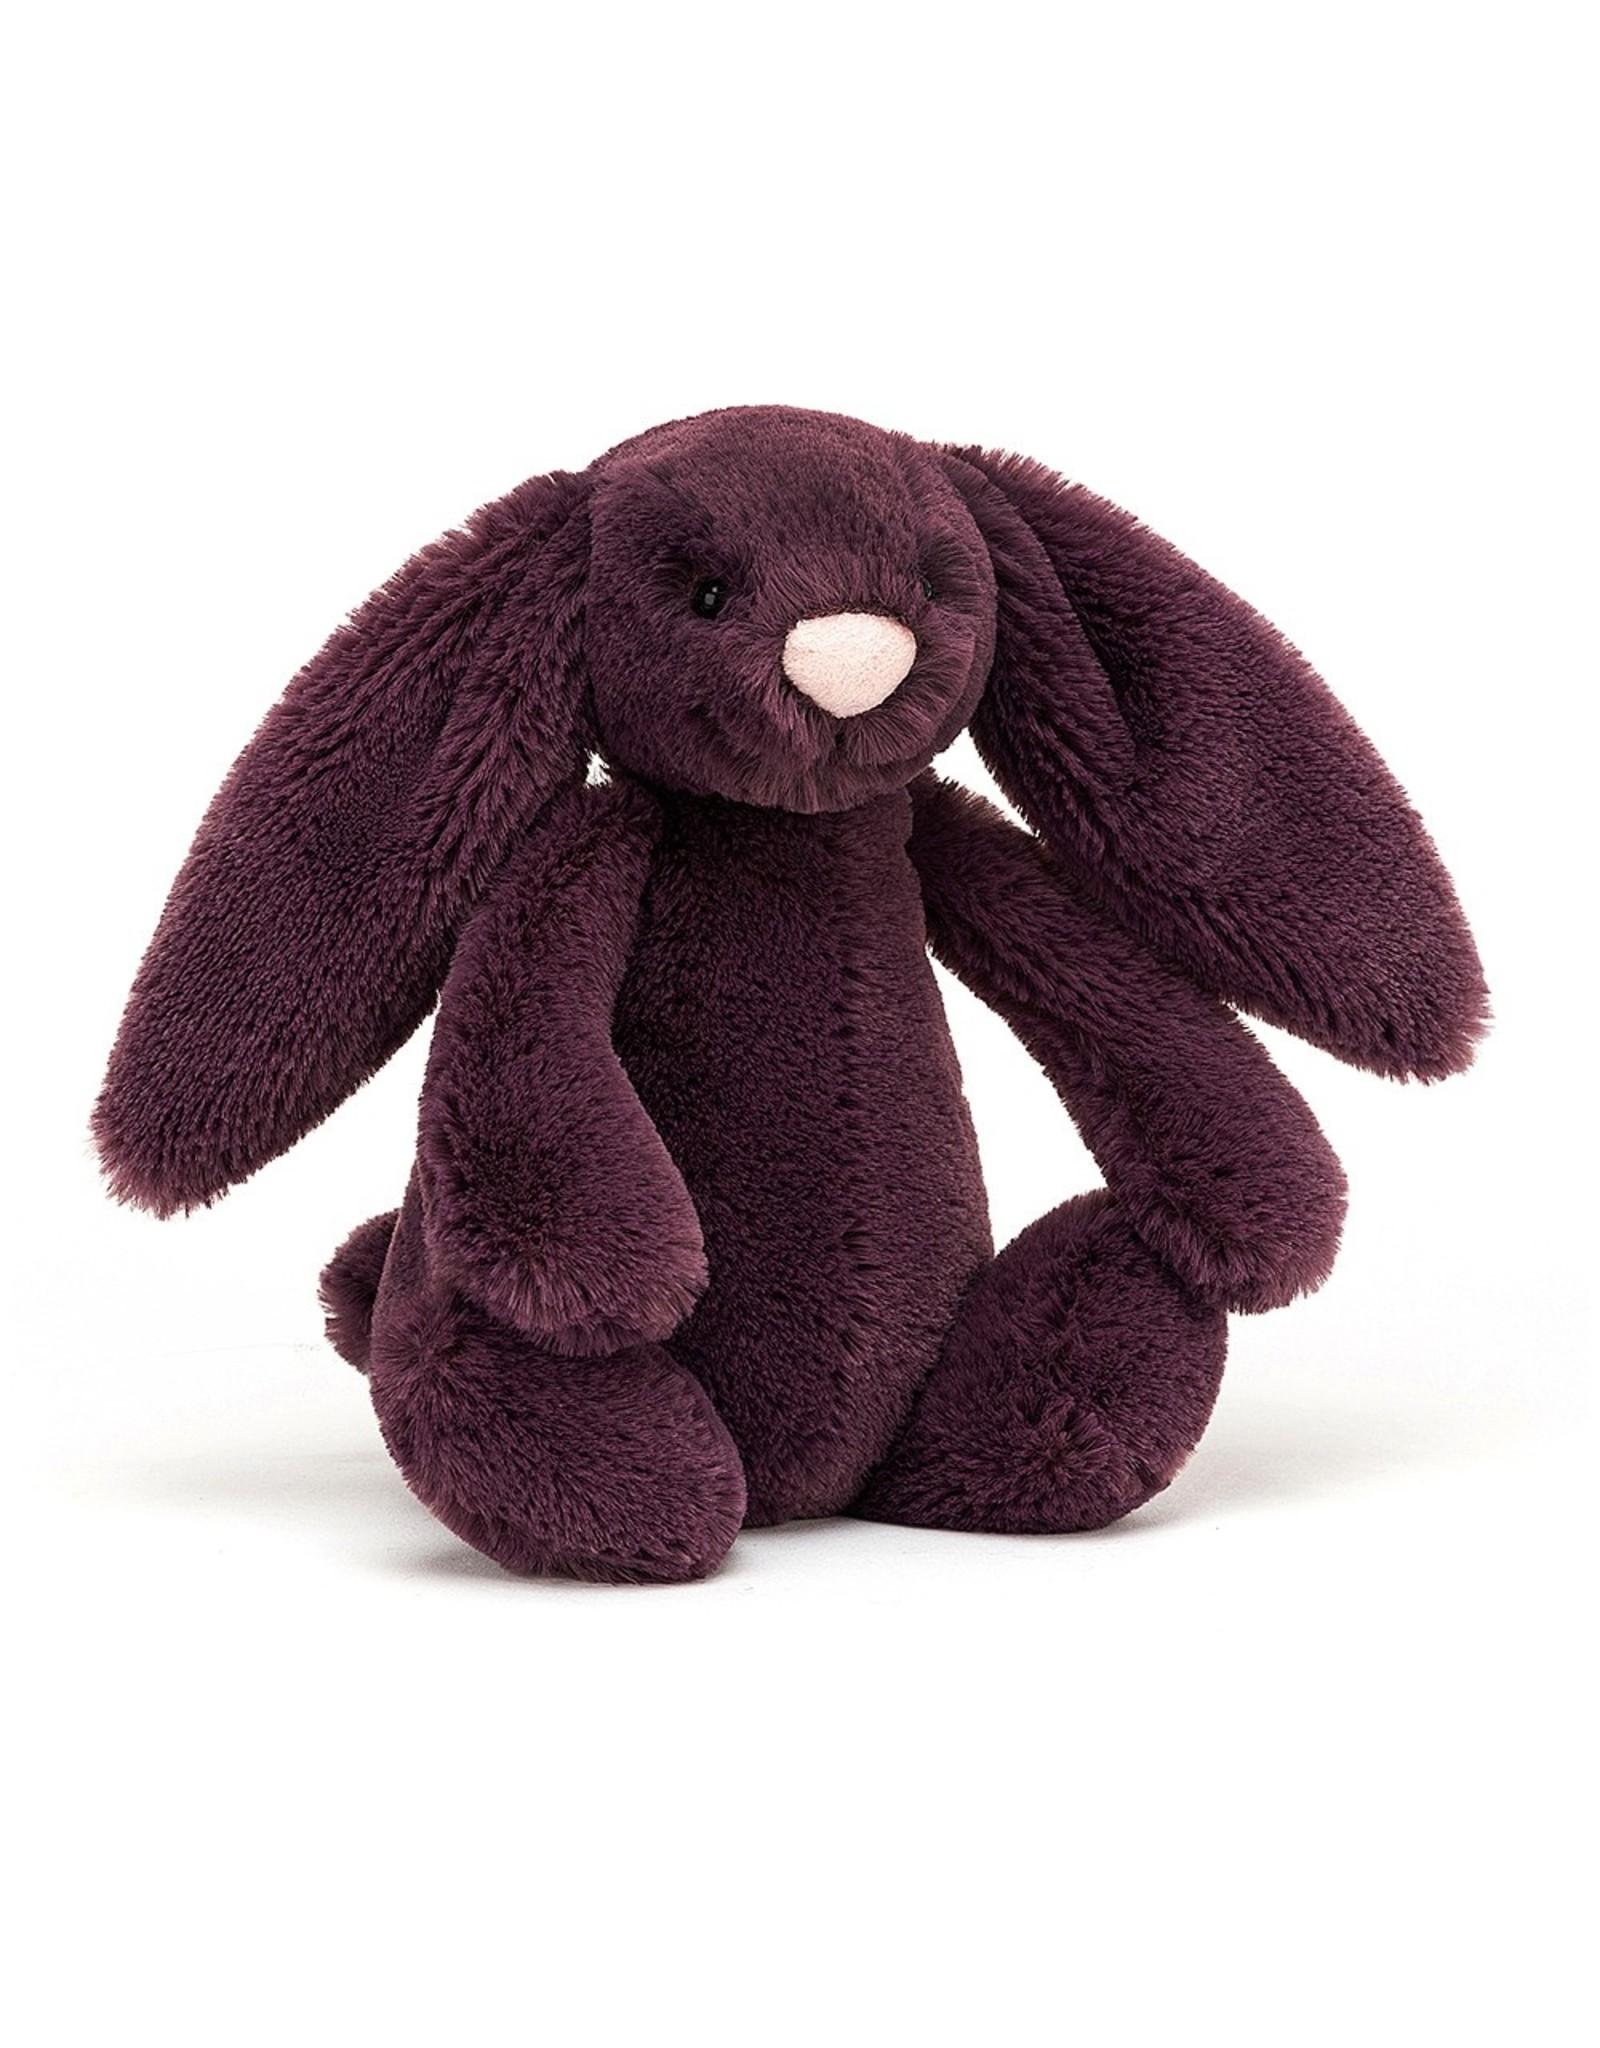 Jellycat Bashful bunny Plum Small